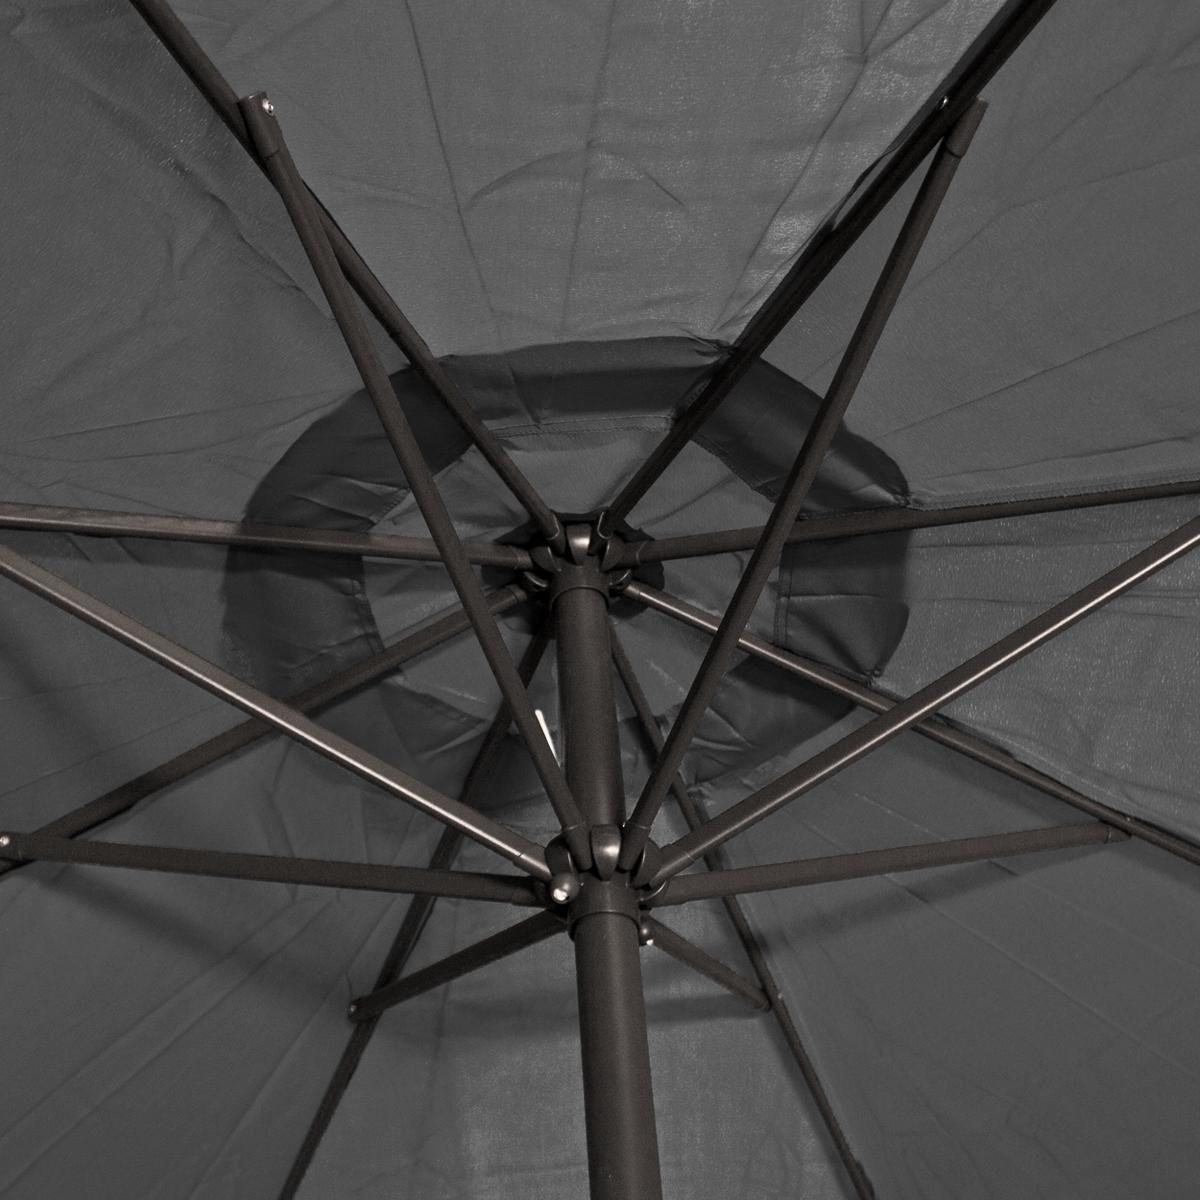 Patio Umbrella Replacement Parts: New Patio Market Outdoor 9 FT 8 Ribs Umbrella Cover Canopy